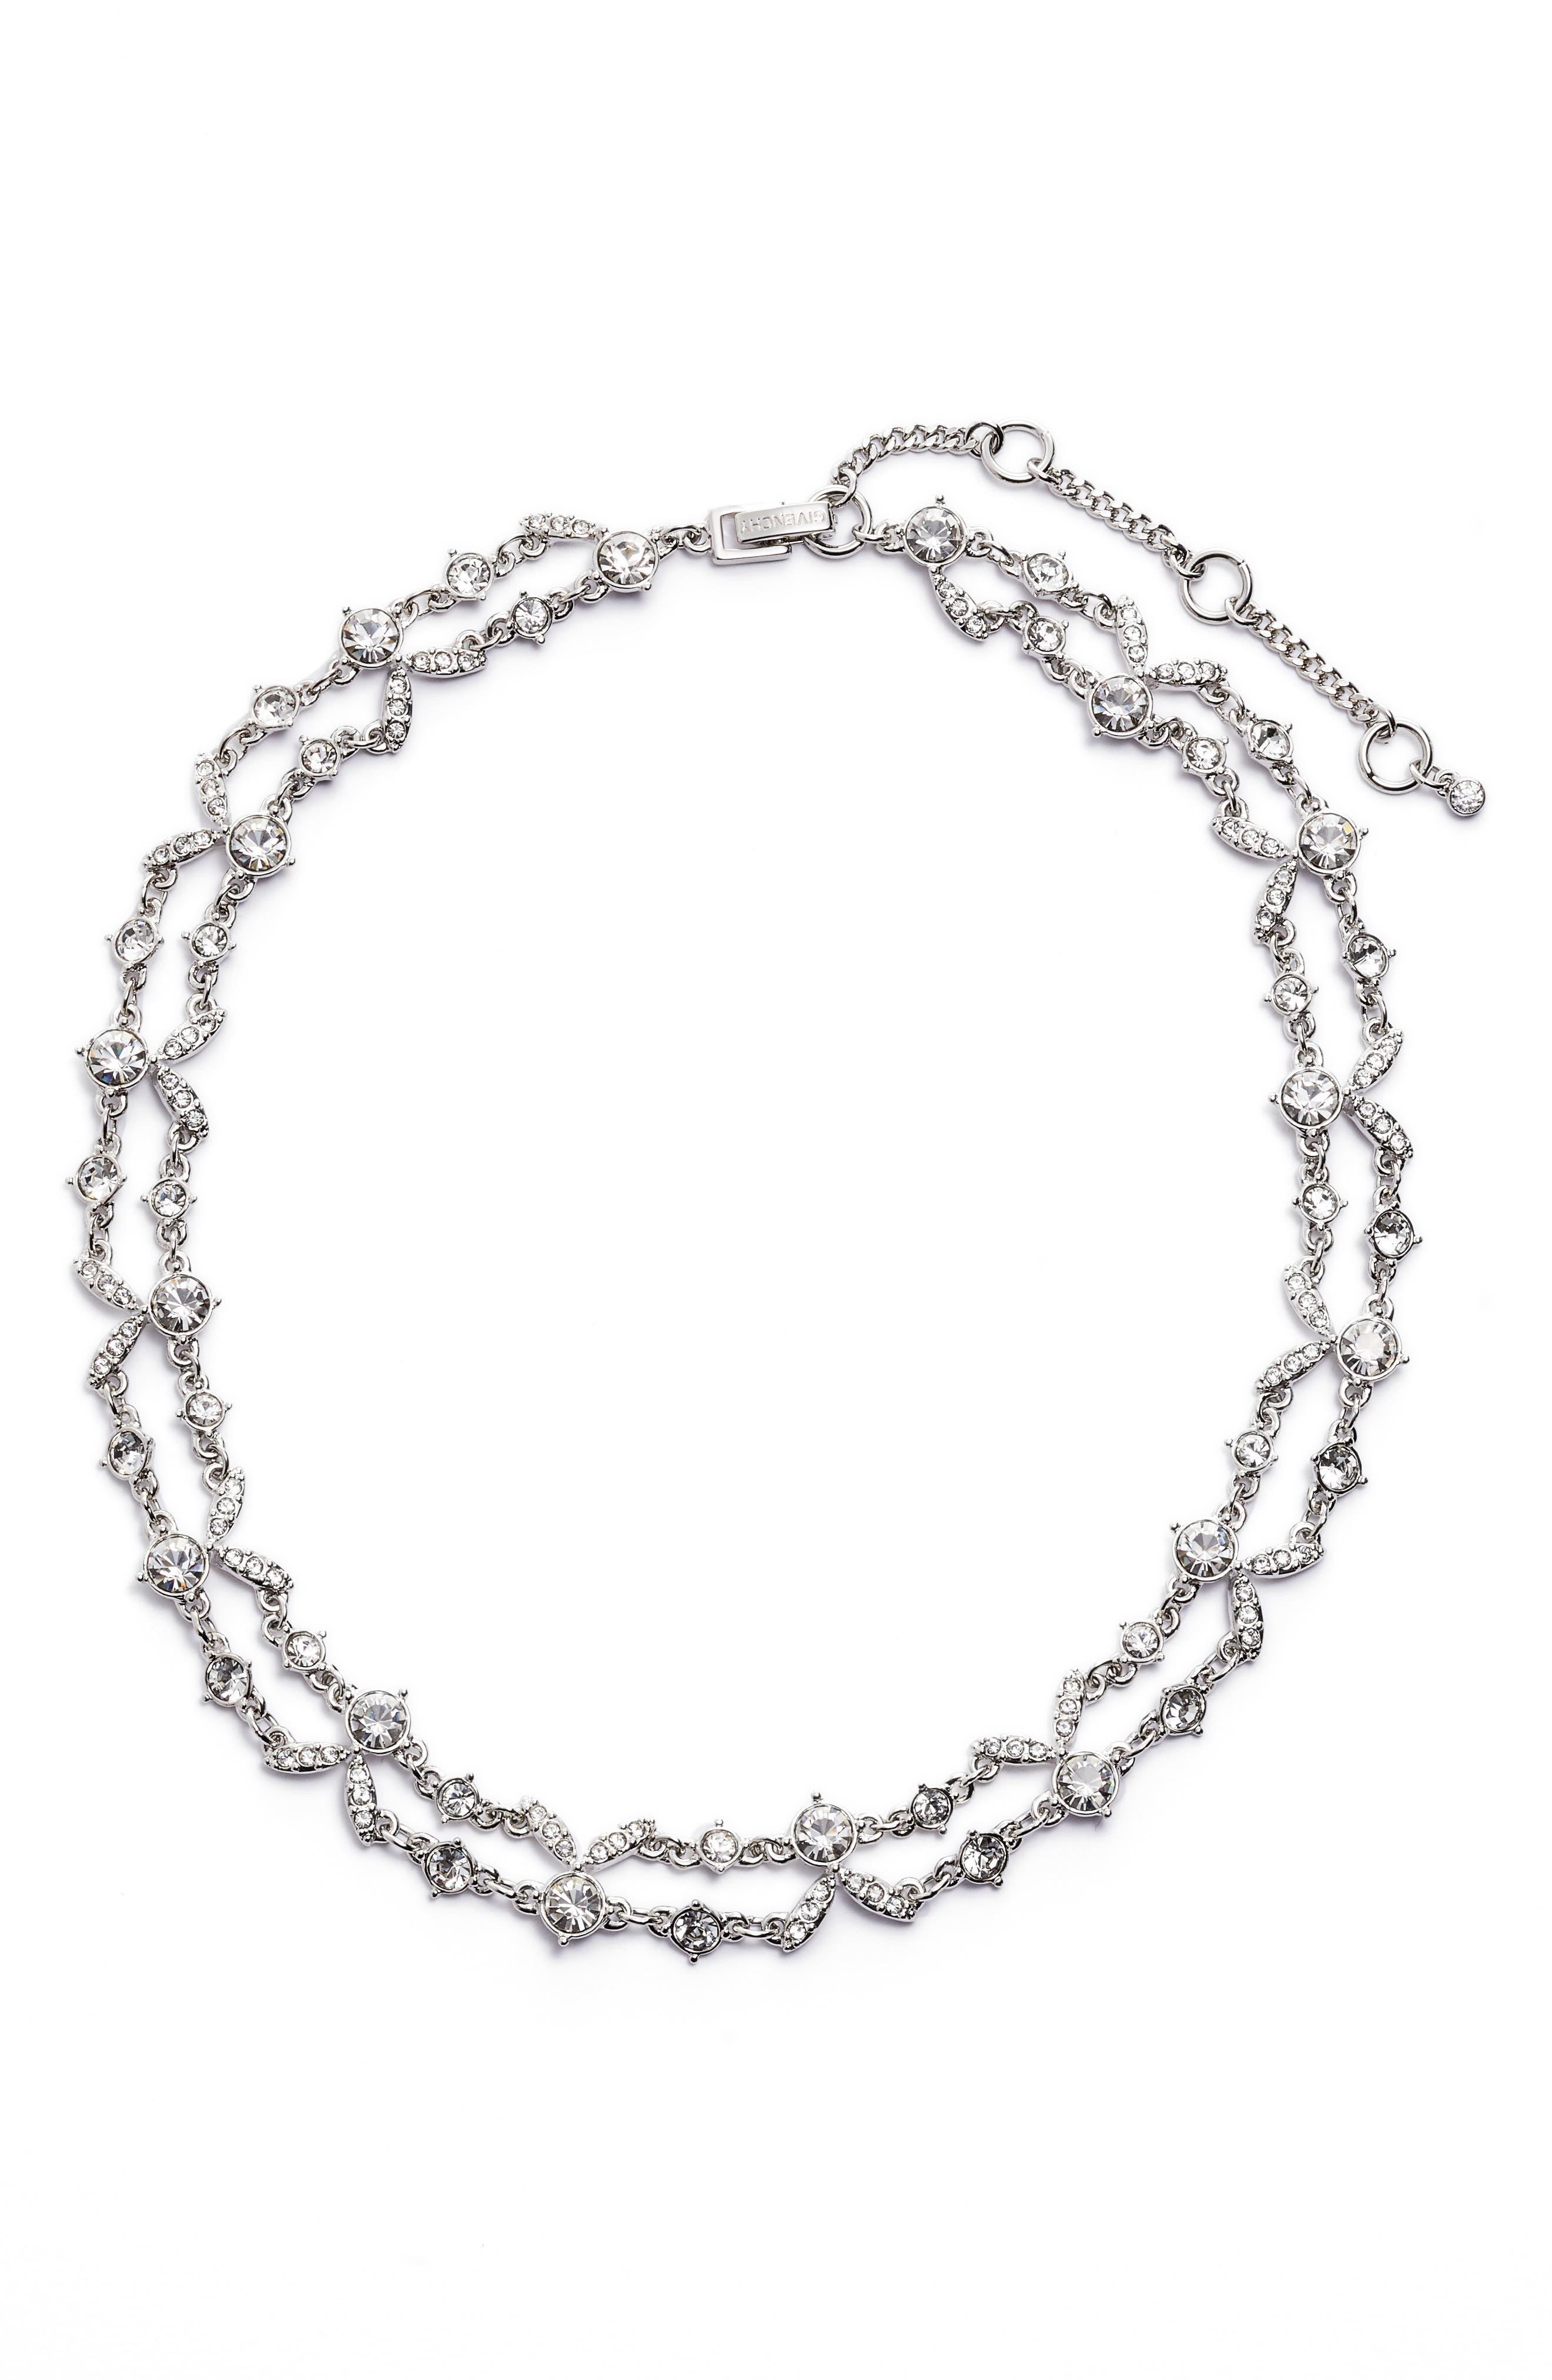 2-Row Crystal Collar Necklace,                             Main thumbnail 1, color,                             040